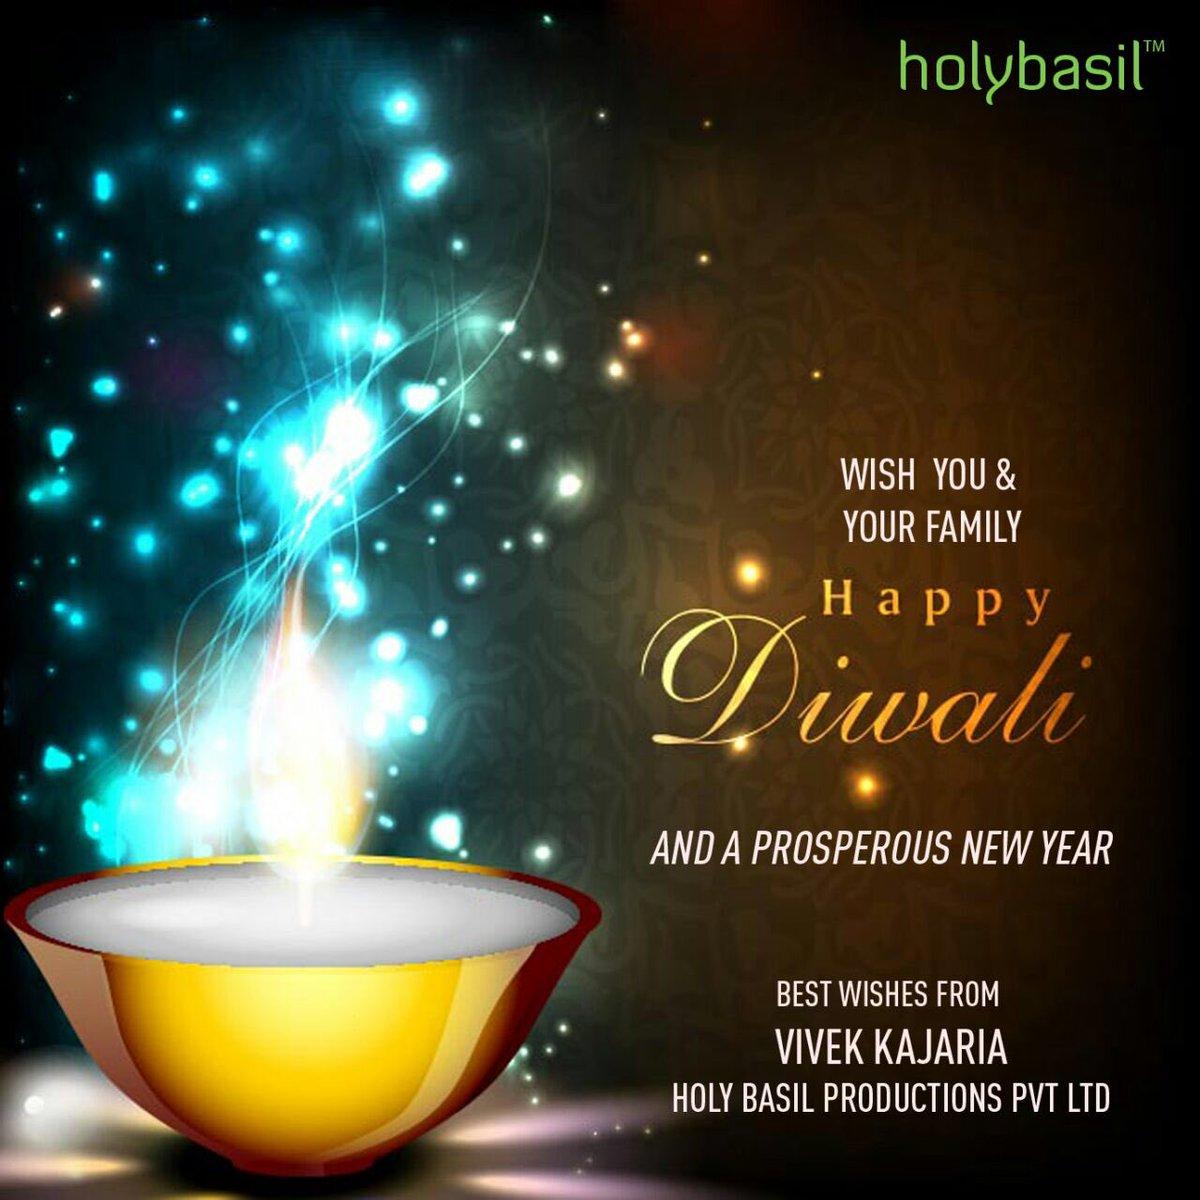 Vivek Kajaria On Twitter Wishing Everyone A Very Happy Diwali And